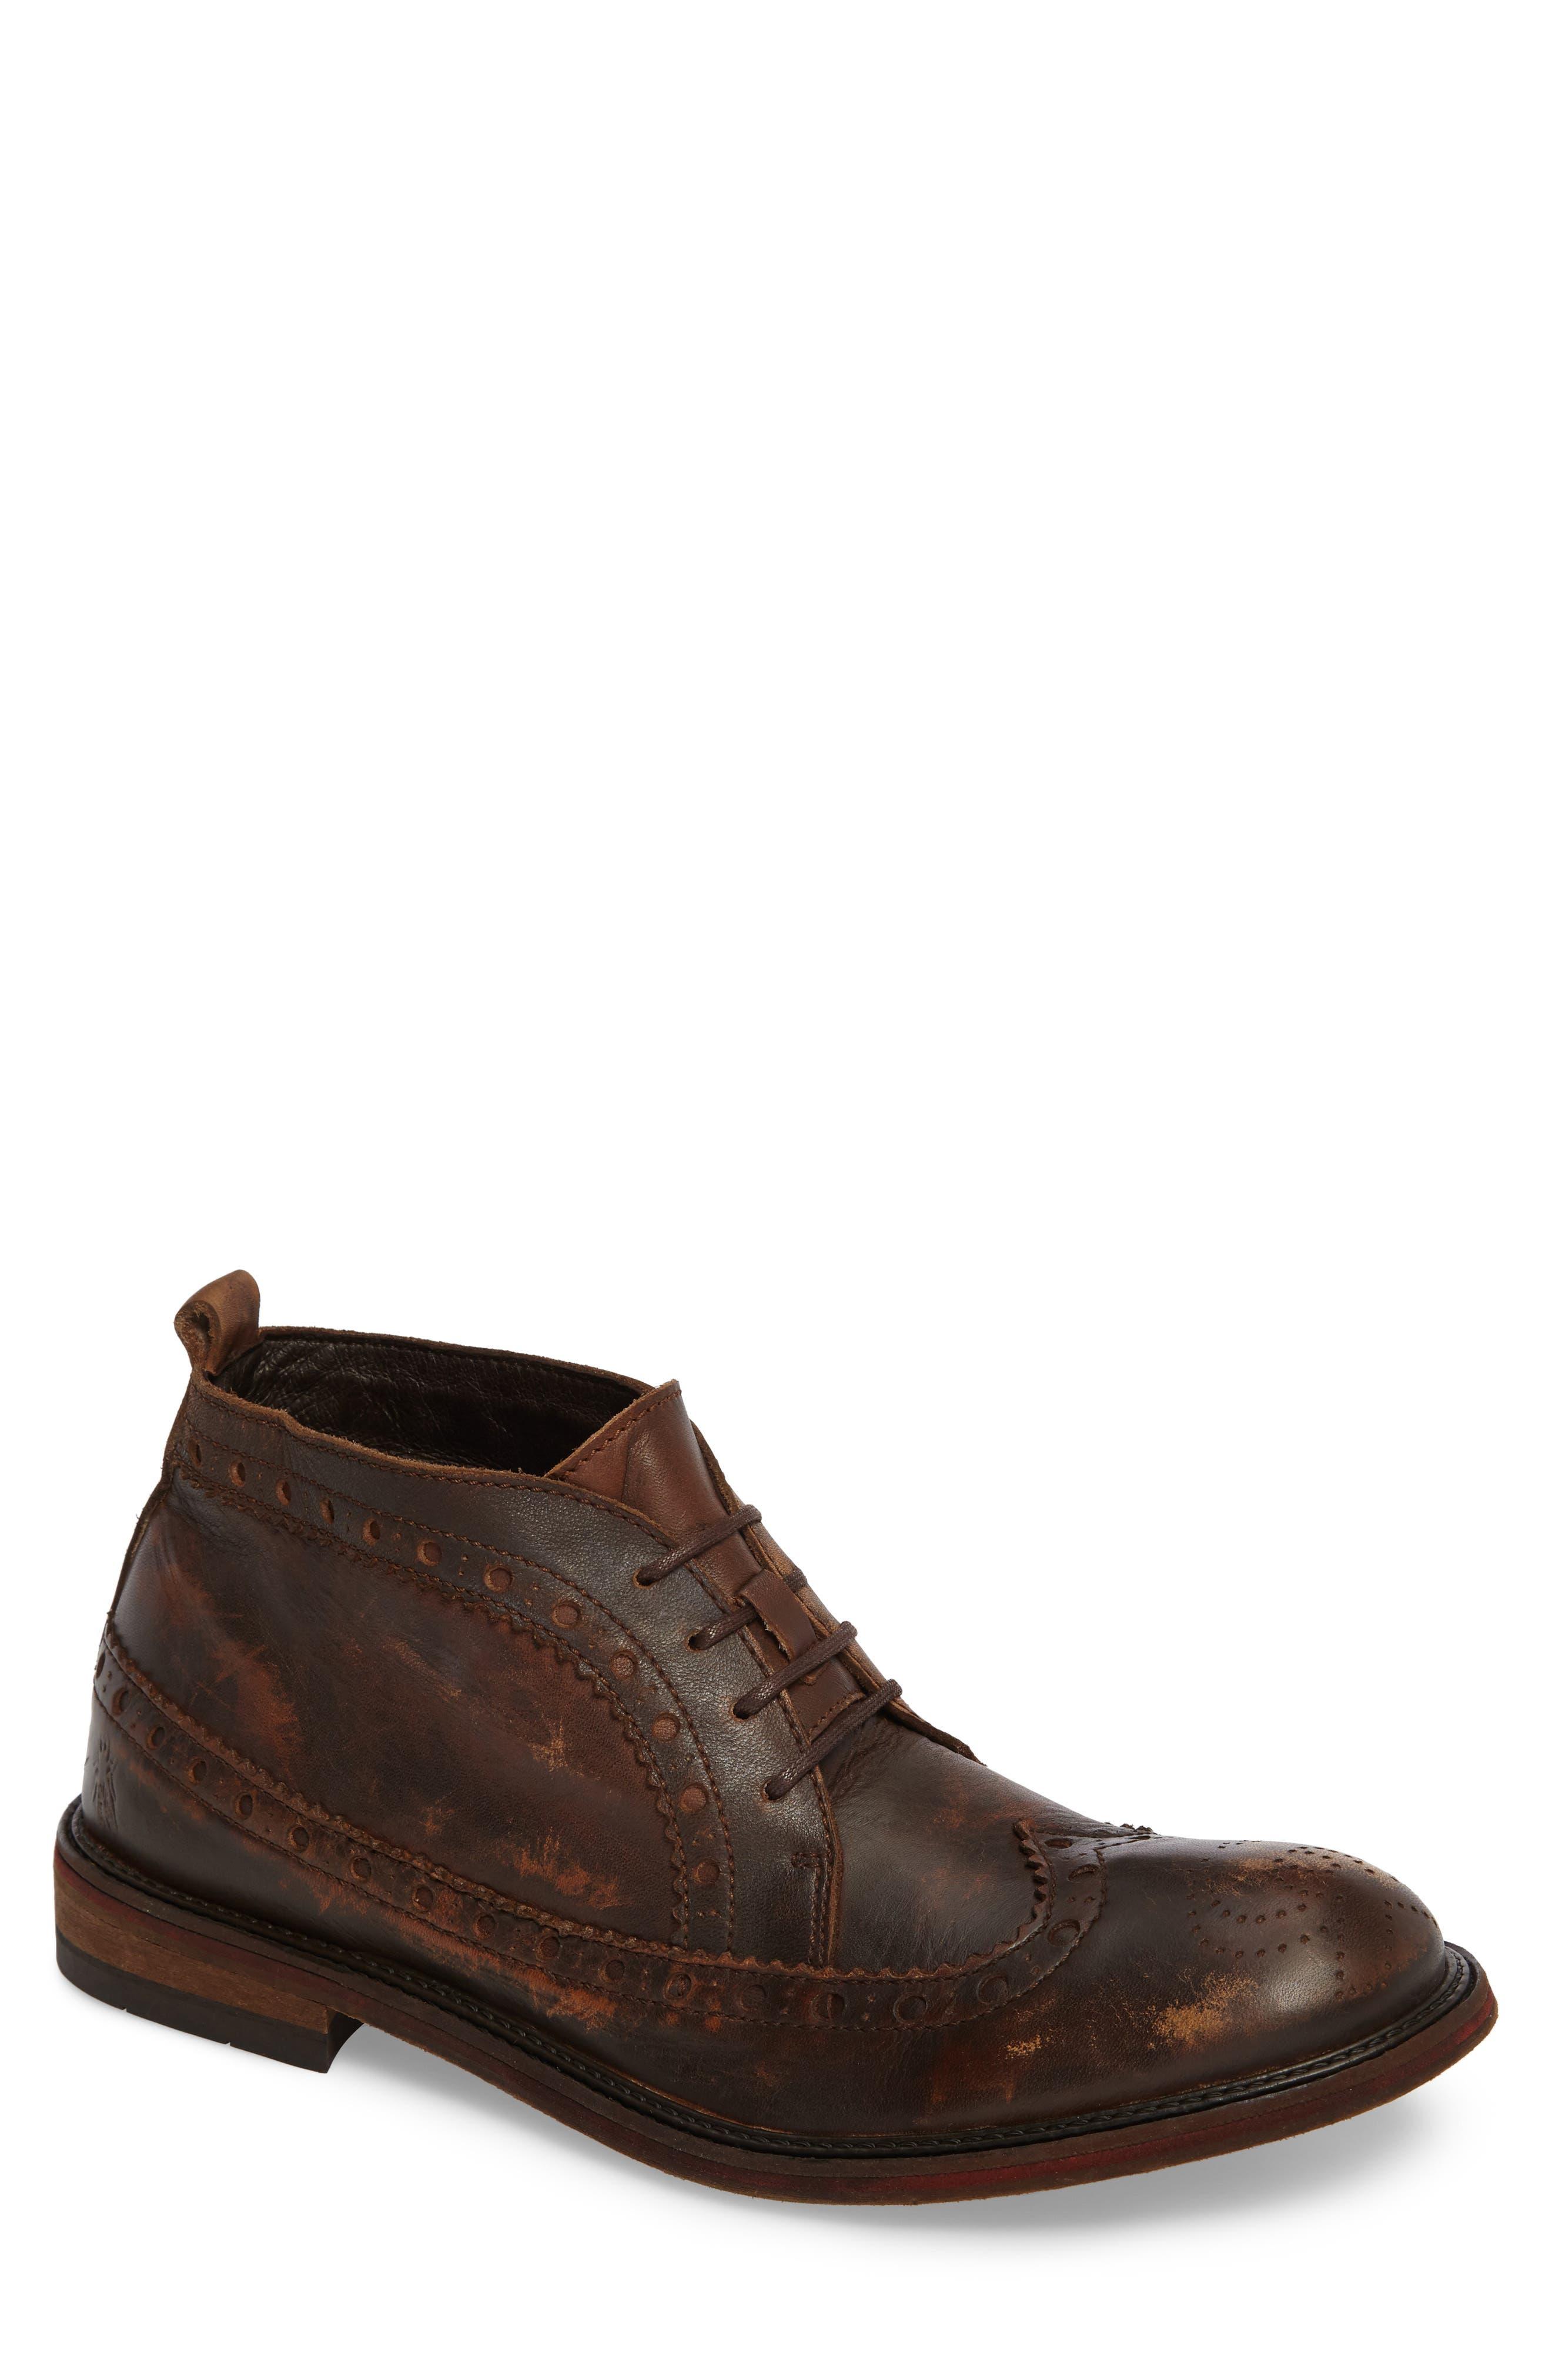 Fly London Wile Wingtip Chukka Boot (Men)